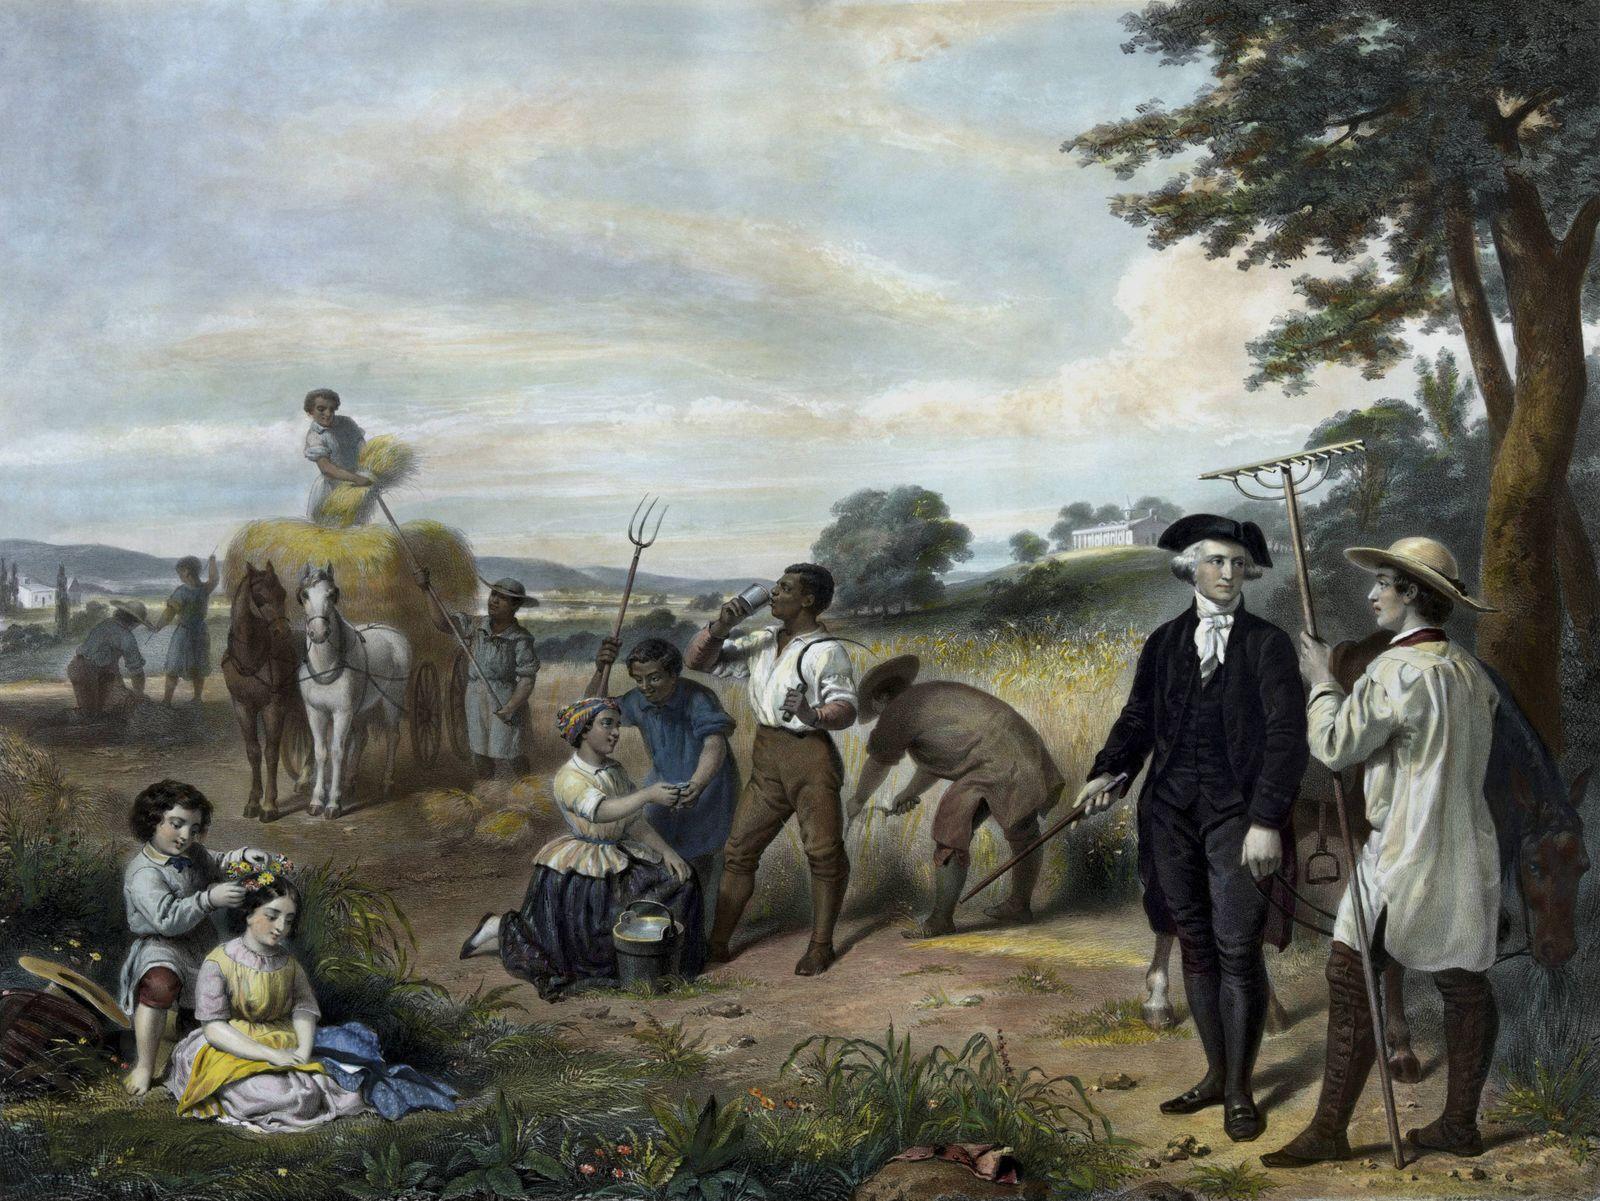 Vintage American history print of George Washington on his farm as slaves work the land behind him